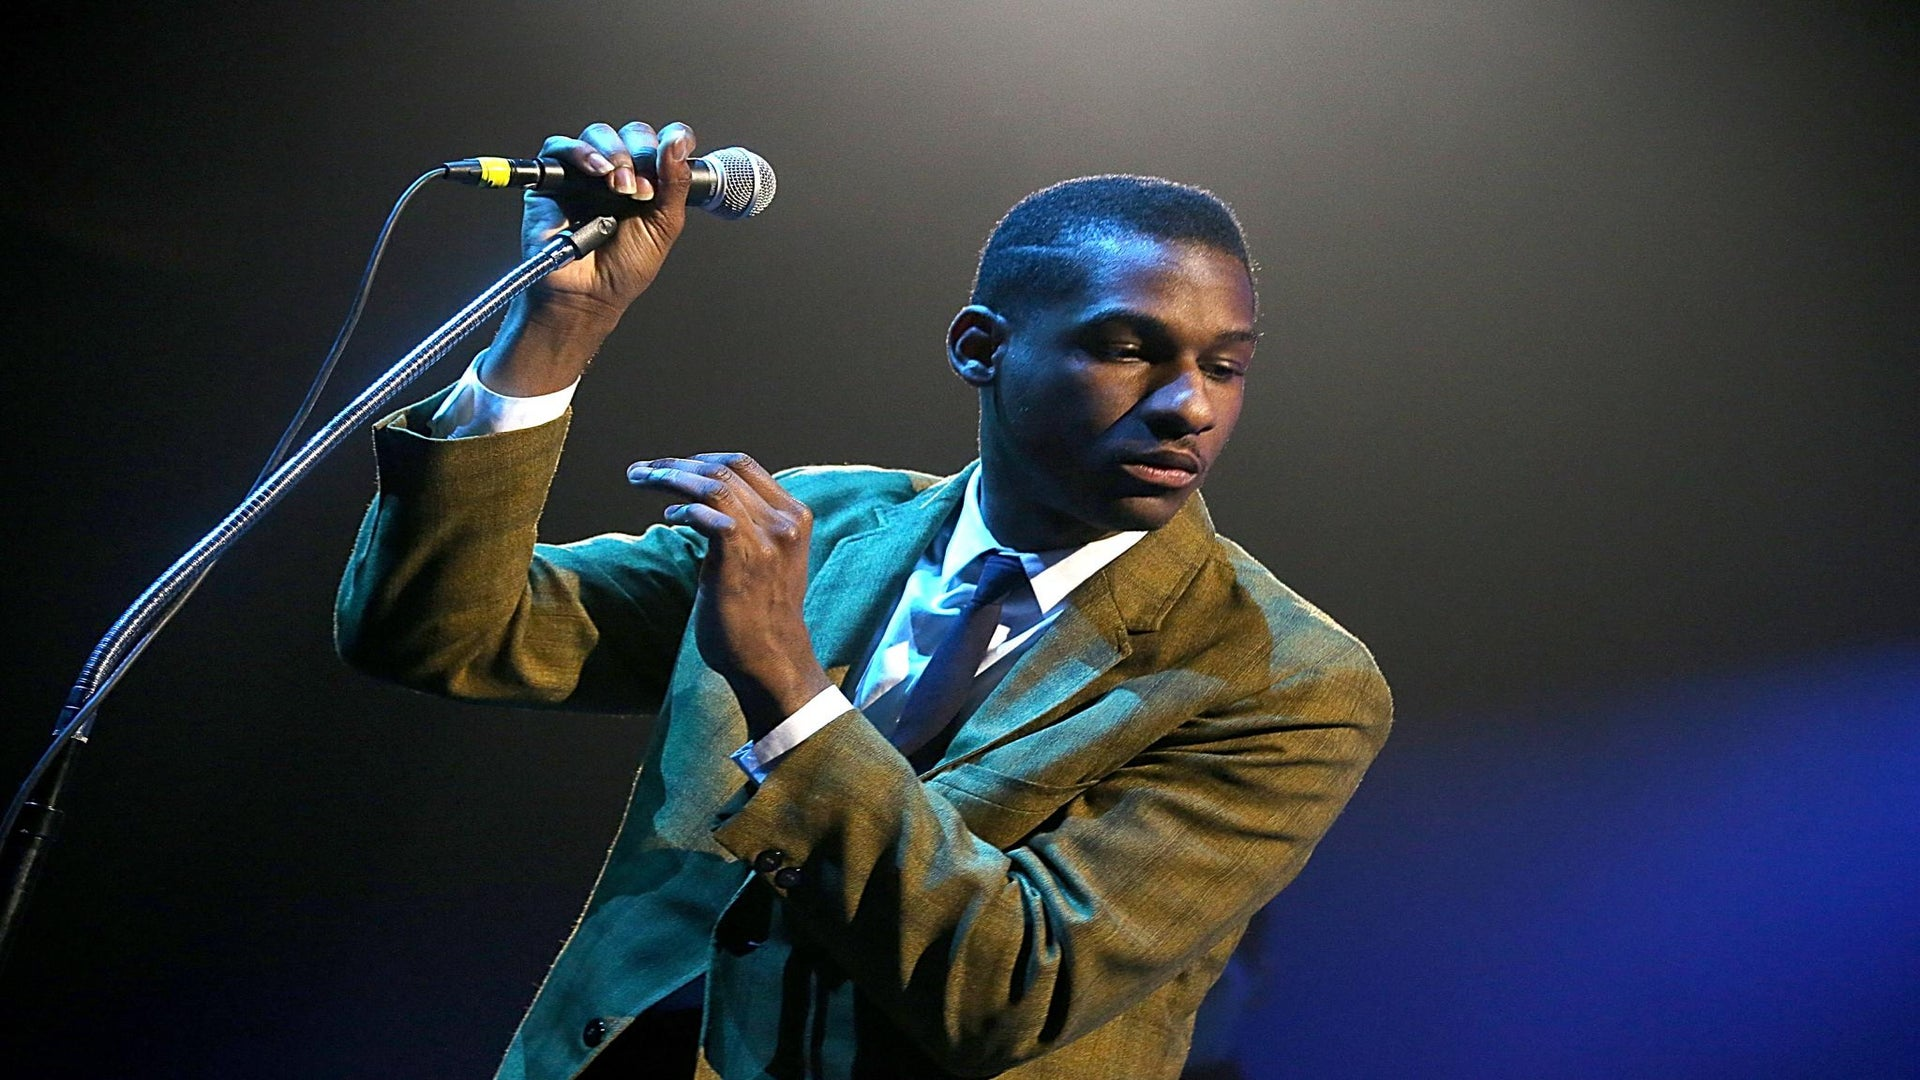 ESSENCE Festival Artist Leon Bridges: My Life in 10 Songs